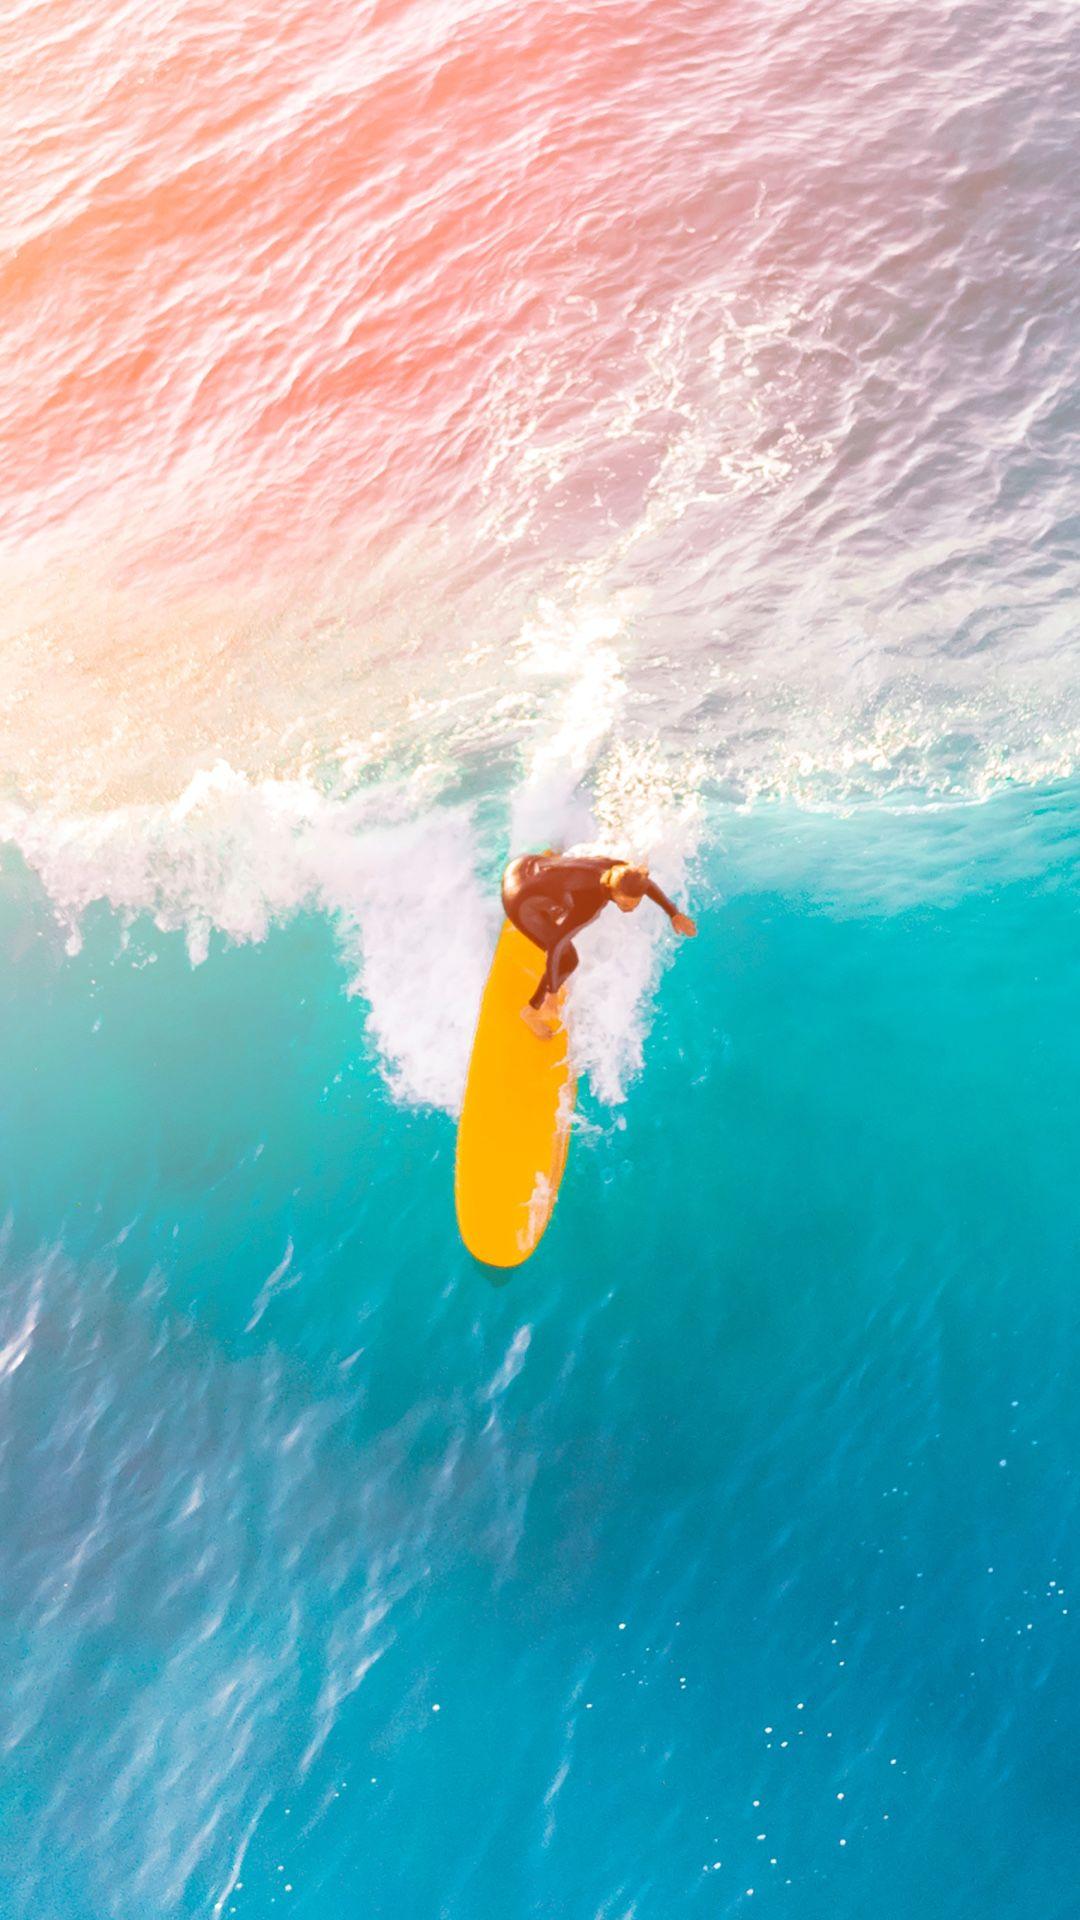 Surf wallpaper Surf wallpaper Surf painting Surfing wallpaper 1080x1920